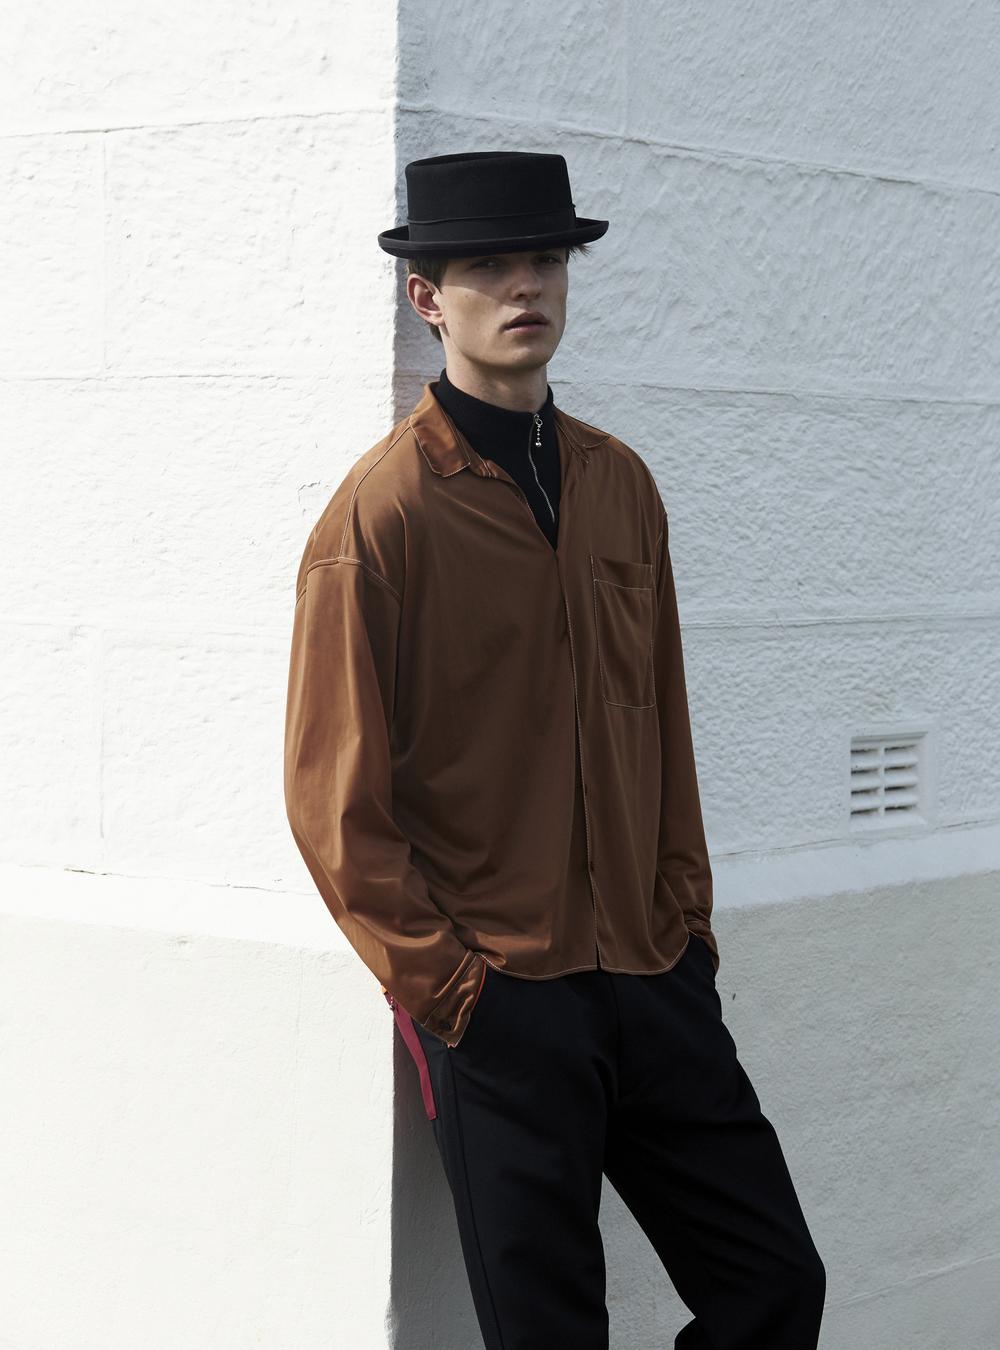 Prada full look, stylist's own hat